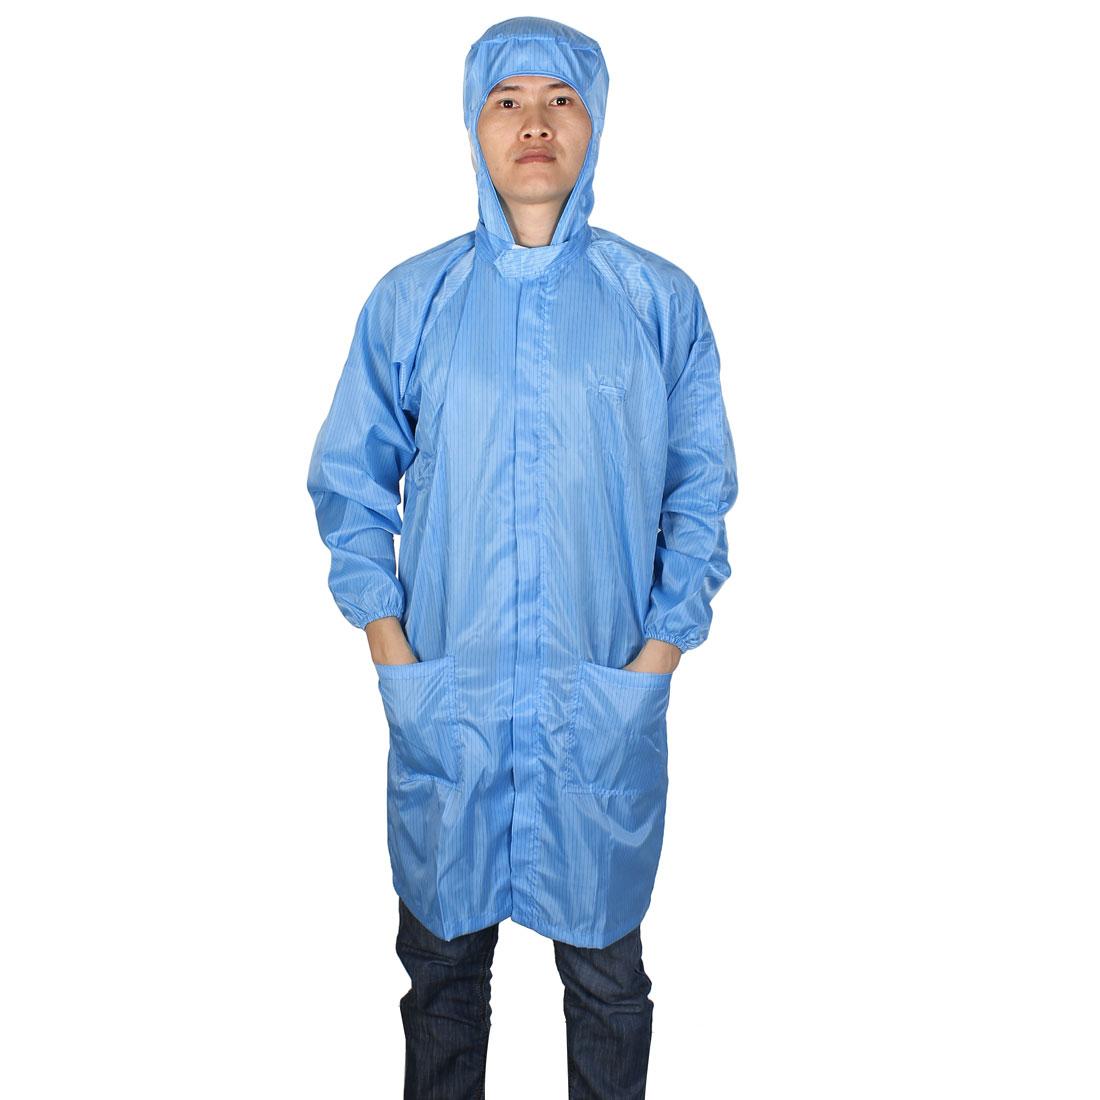 Unisex Long Sleeve Stripes Pattern Clean Room Anti Static Coat Uniform Blue XXL